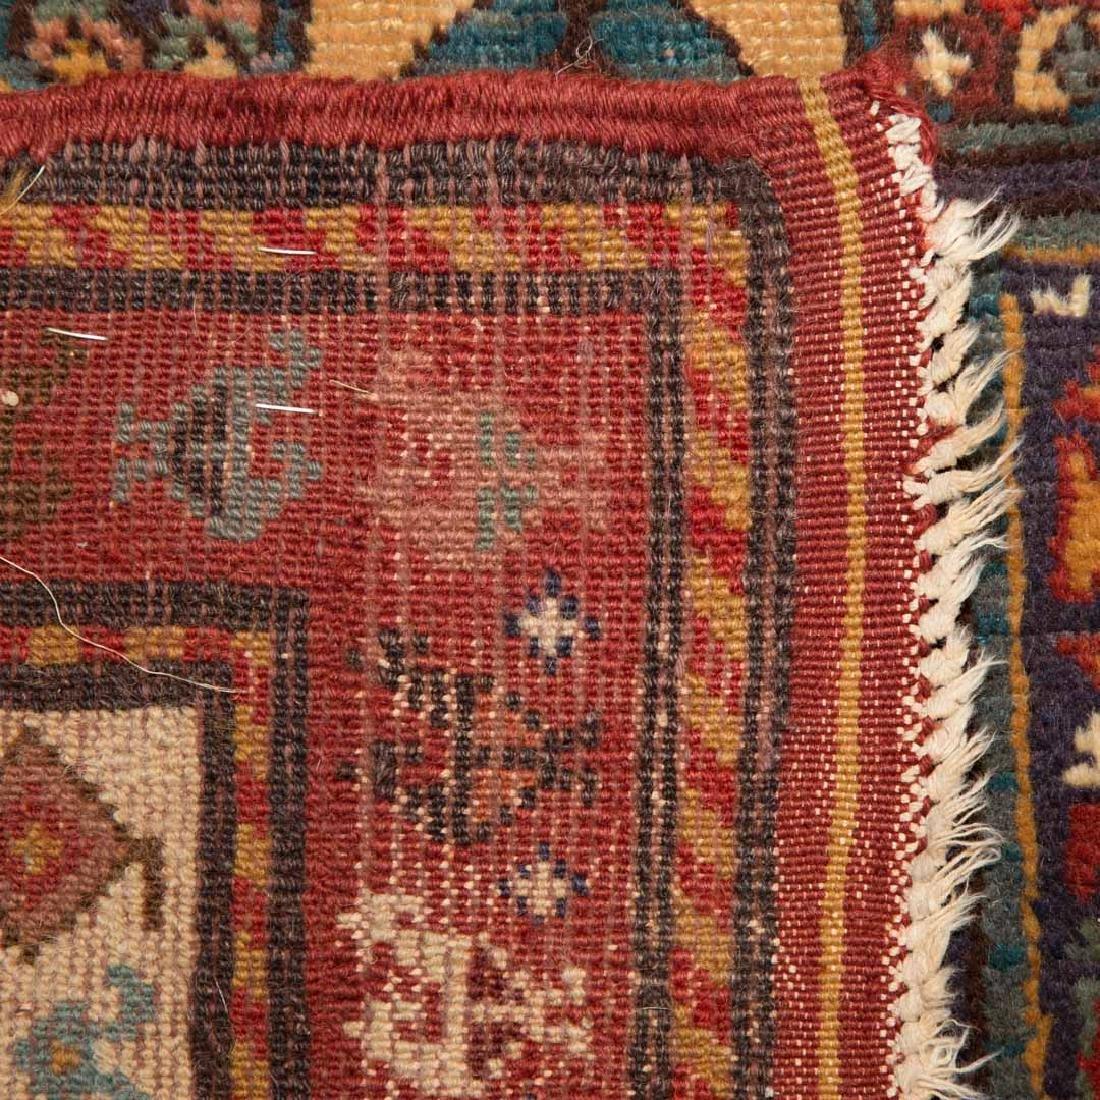 Antique Kazak rug, approx. 3.4 x 8.4 - 3